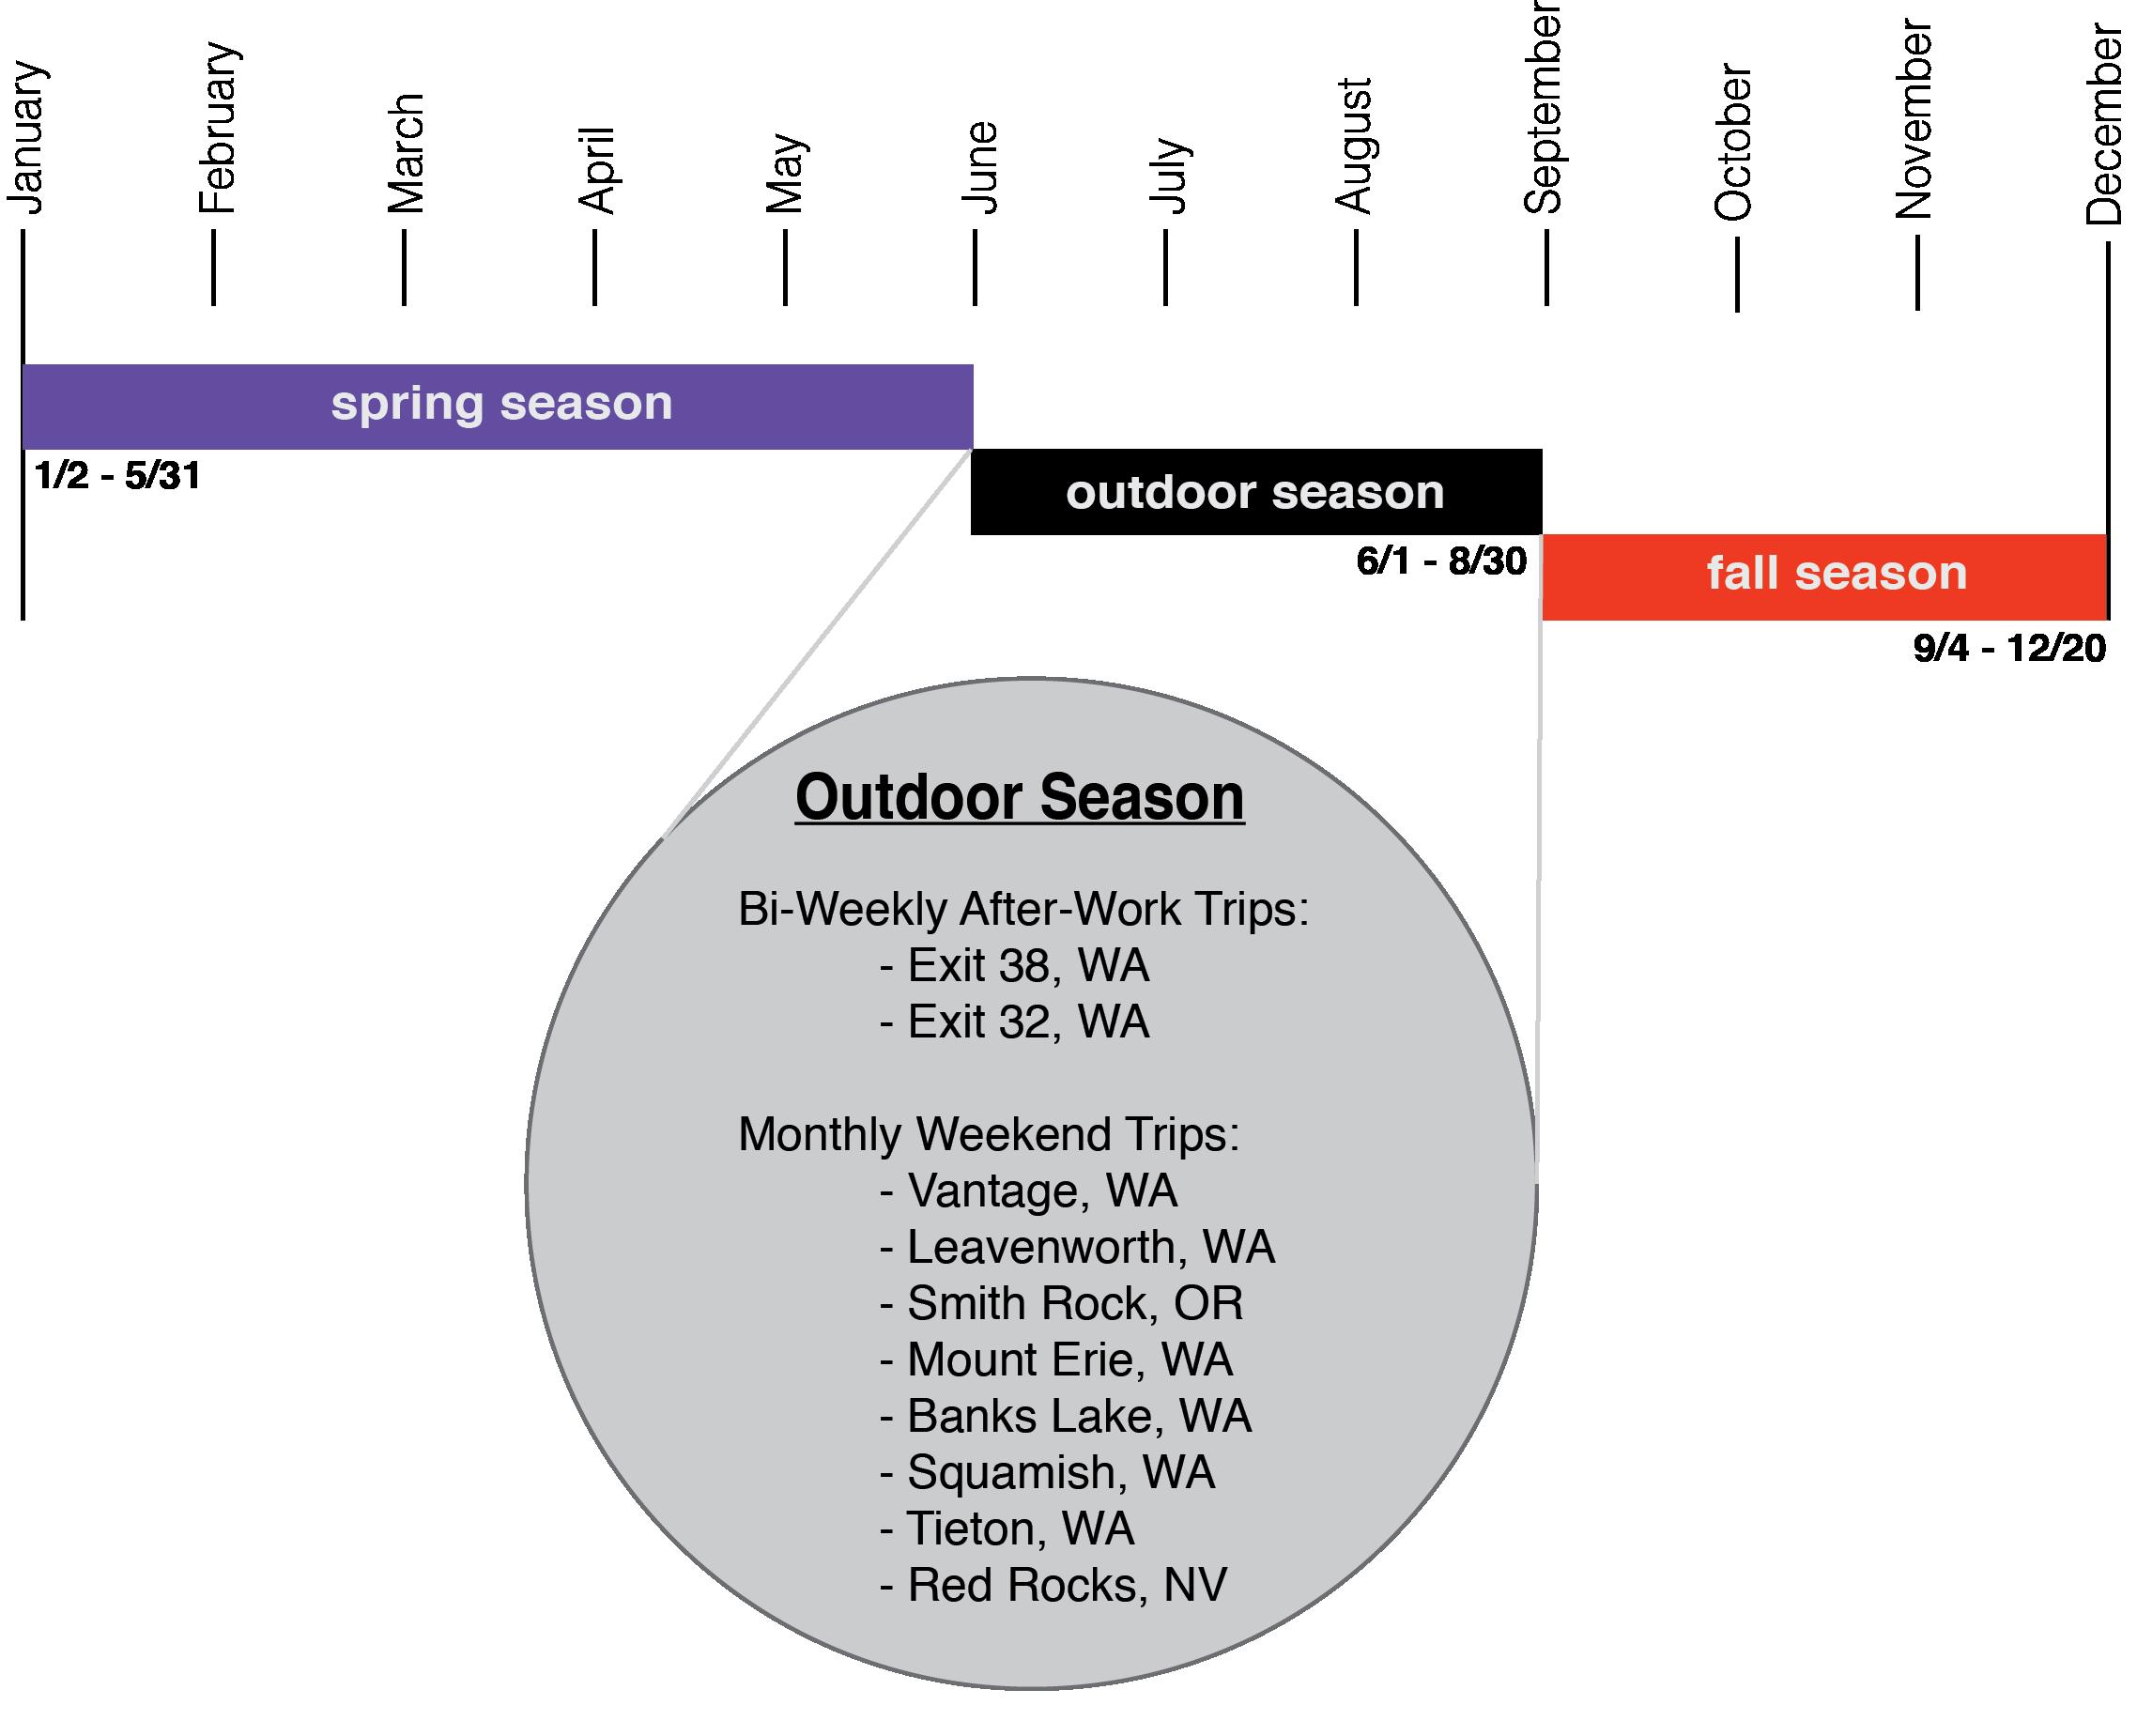 NSM_Seasons_2018 Outdoor.png